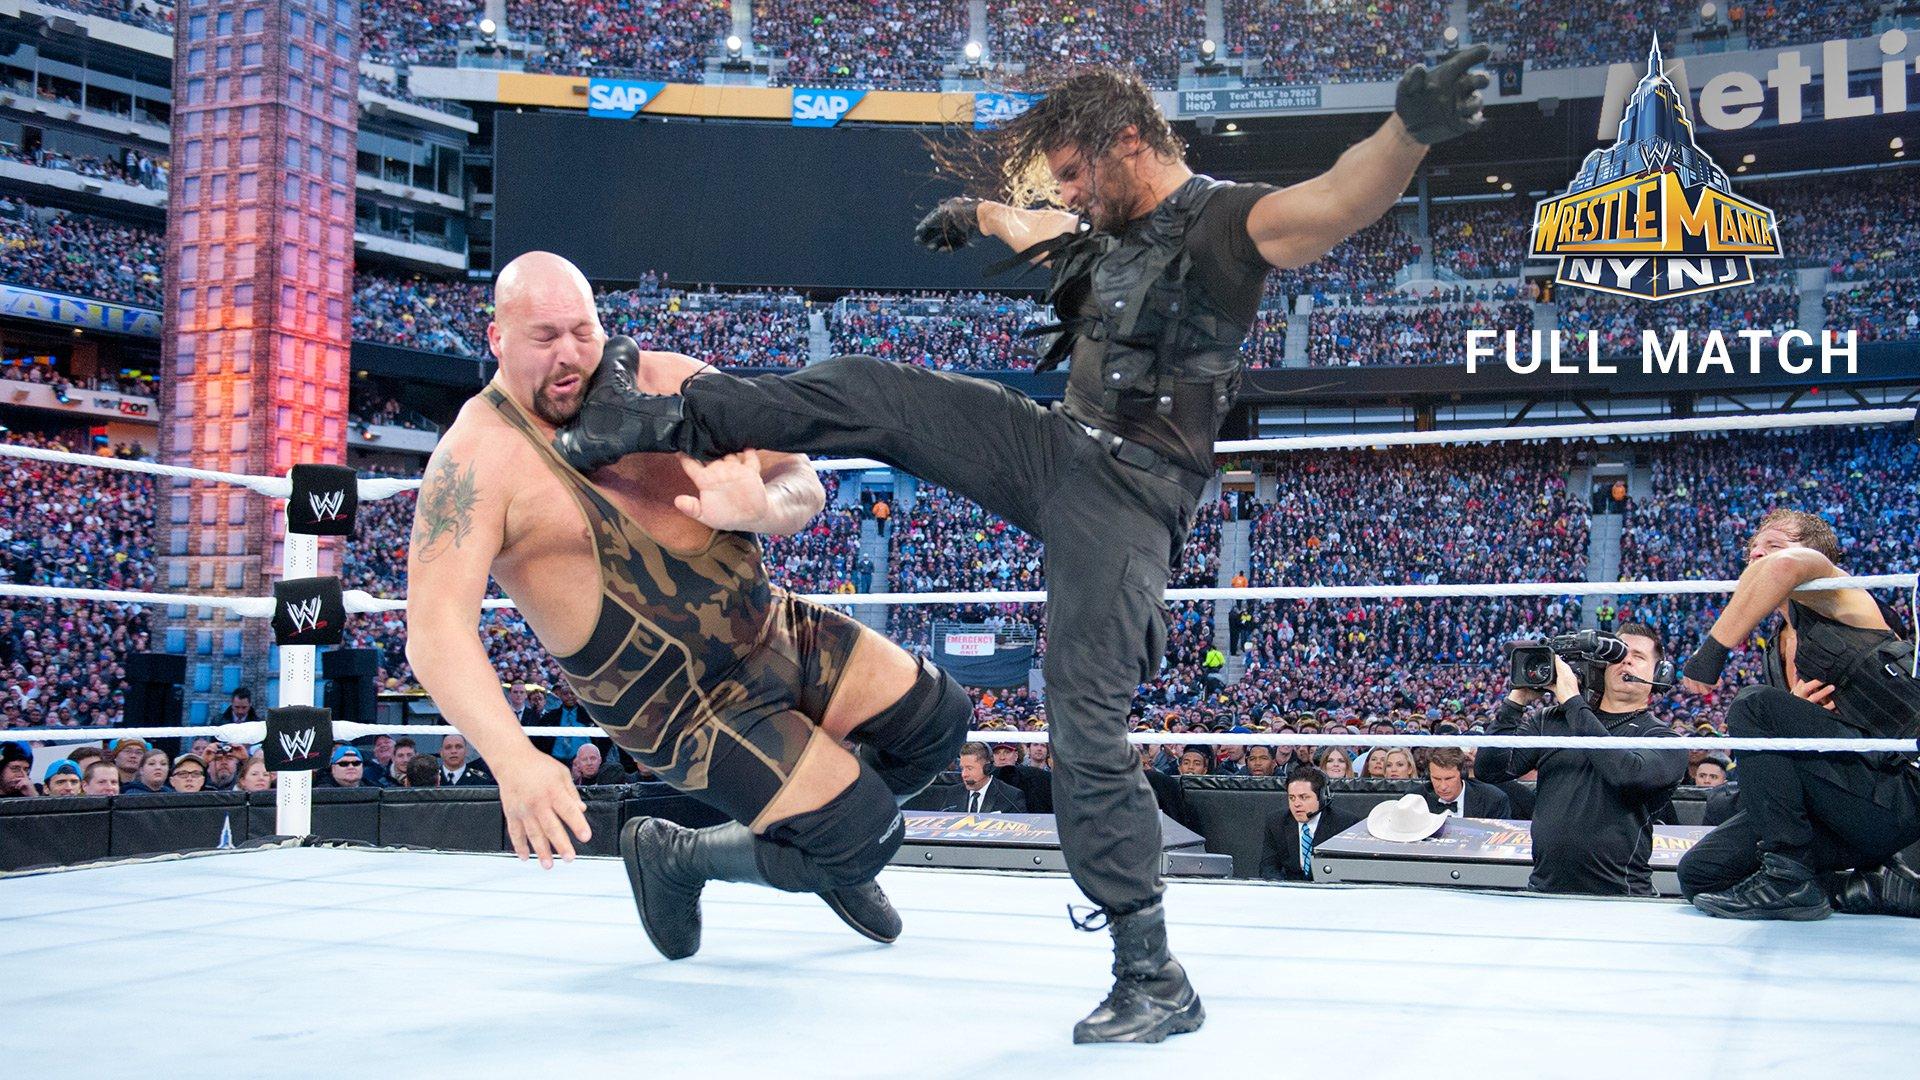 wwe wrestlemania 29 full show download hd